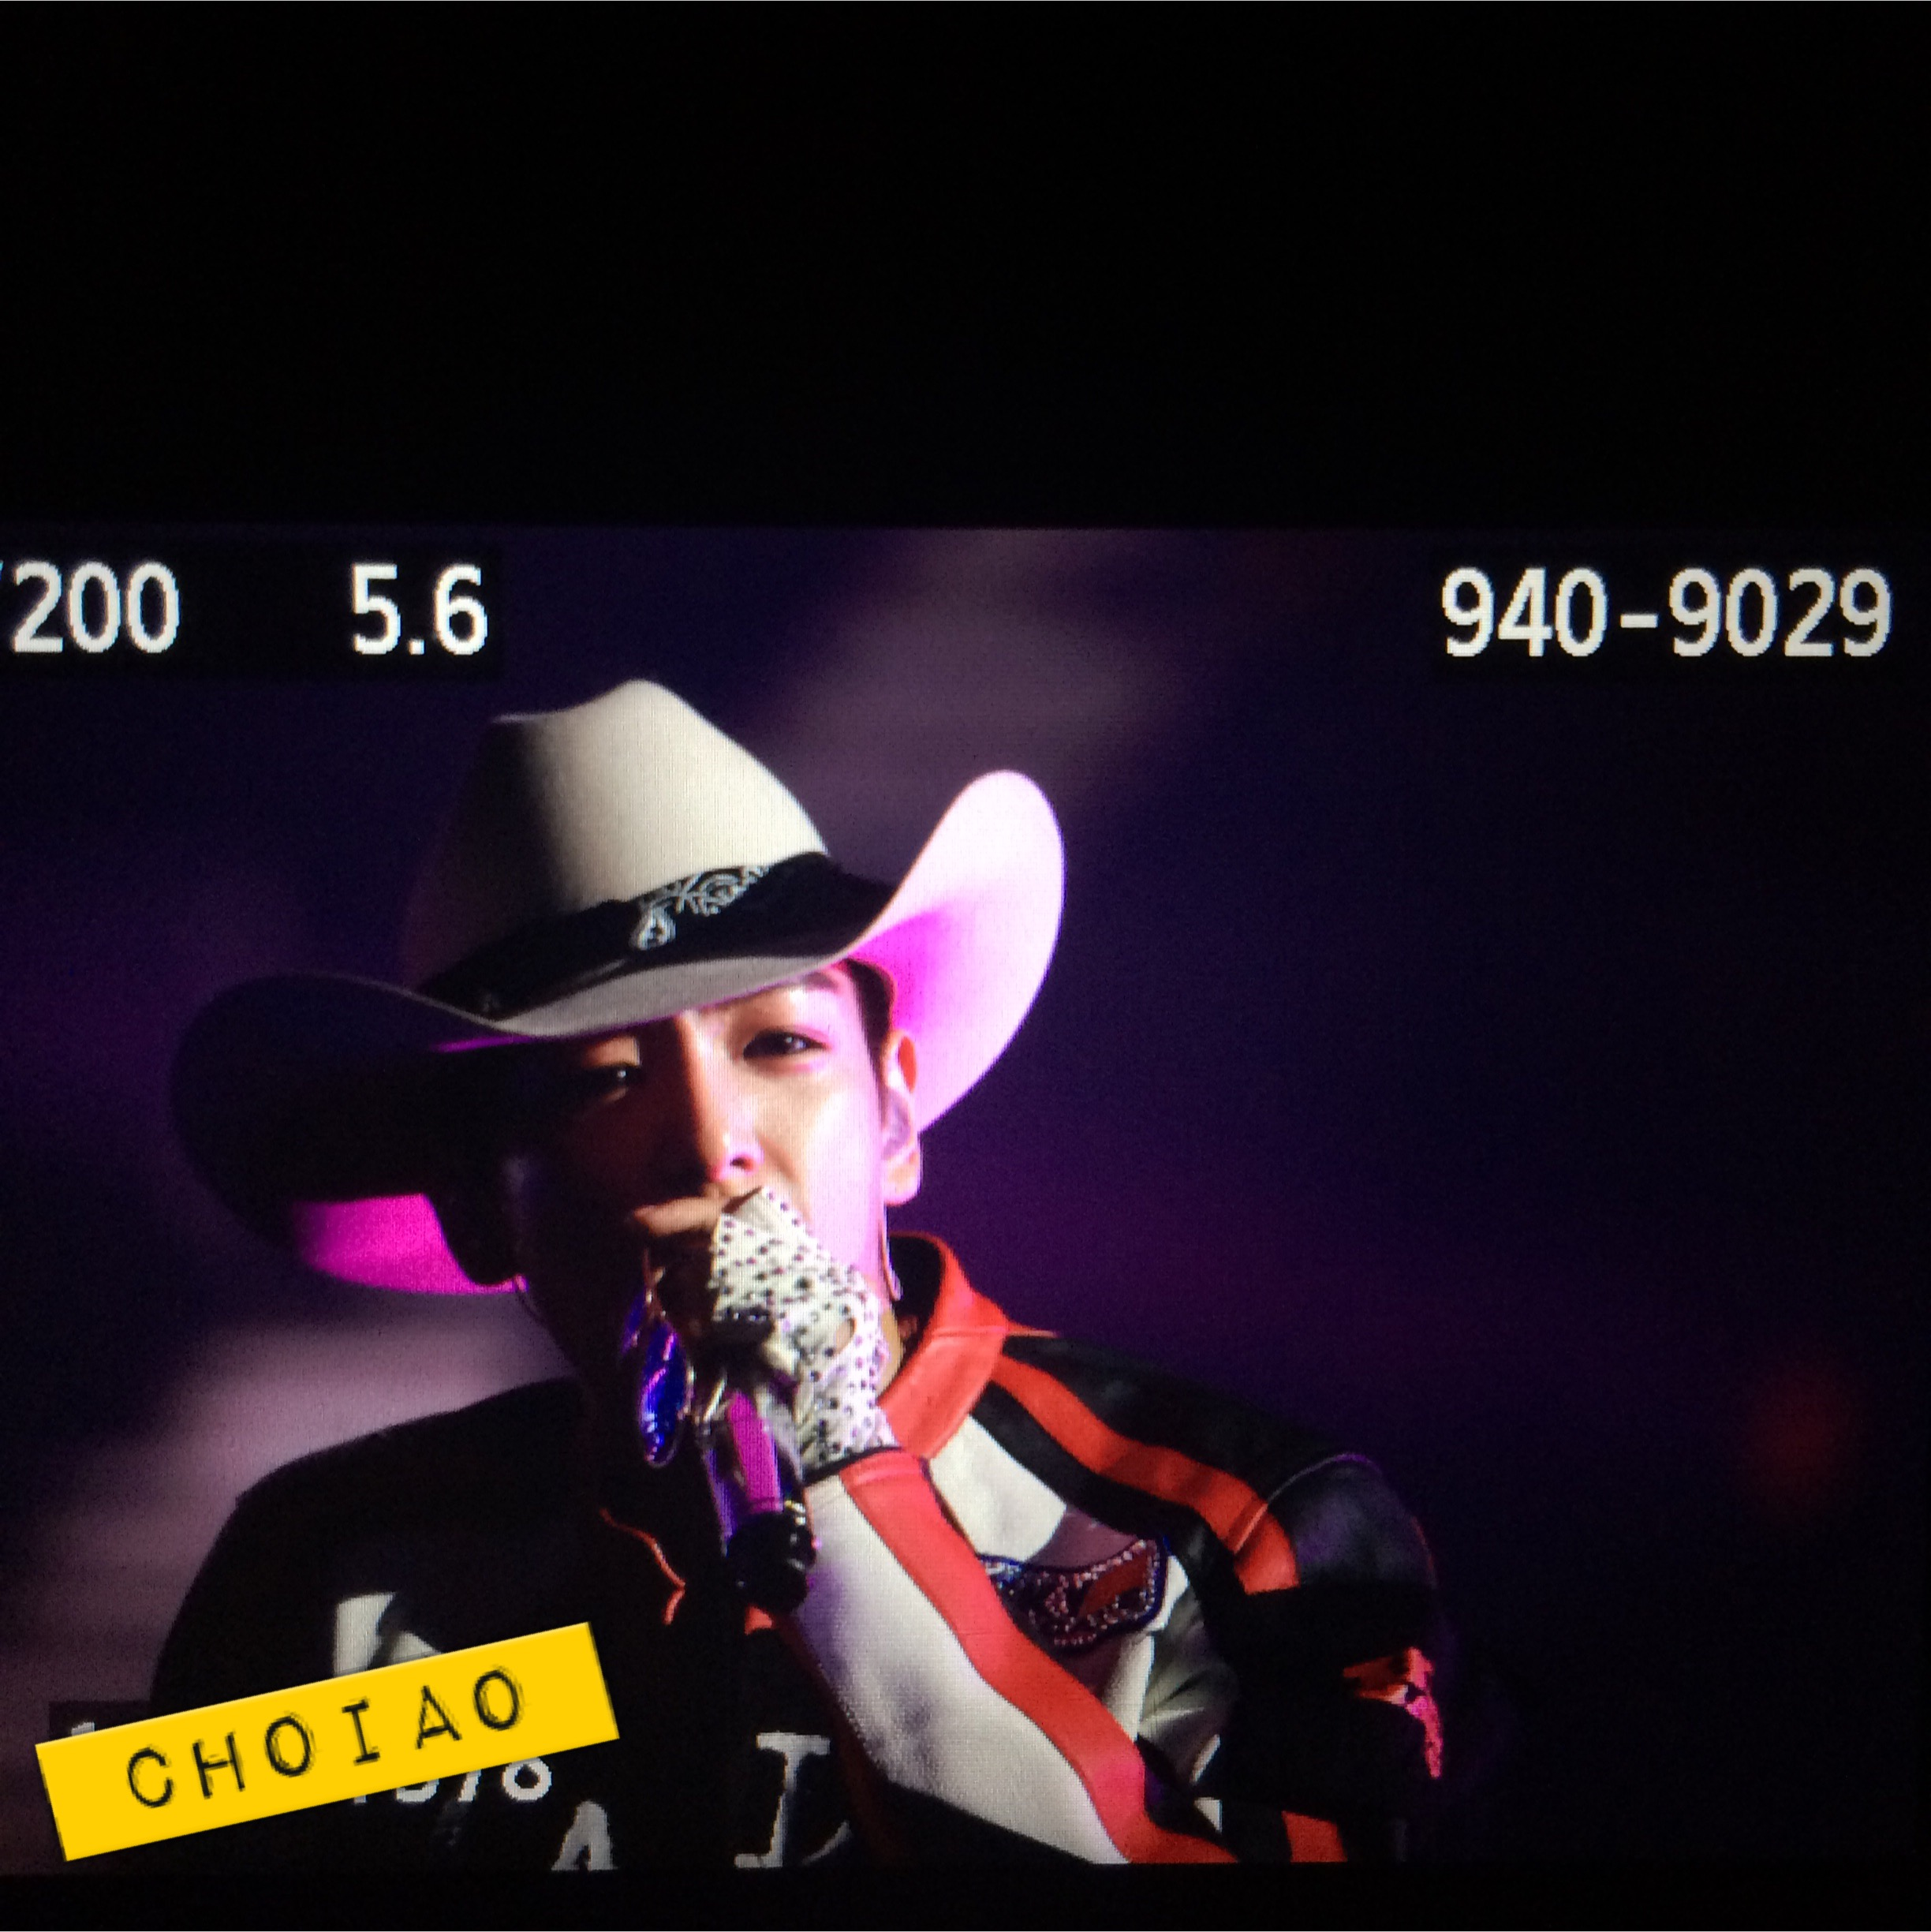 BIGBANG - Made Tour 2015 - Beijing - 05jun2015 - ChoiAo - 01.jpg